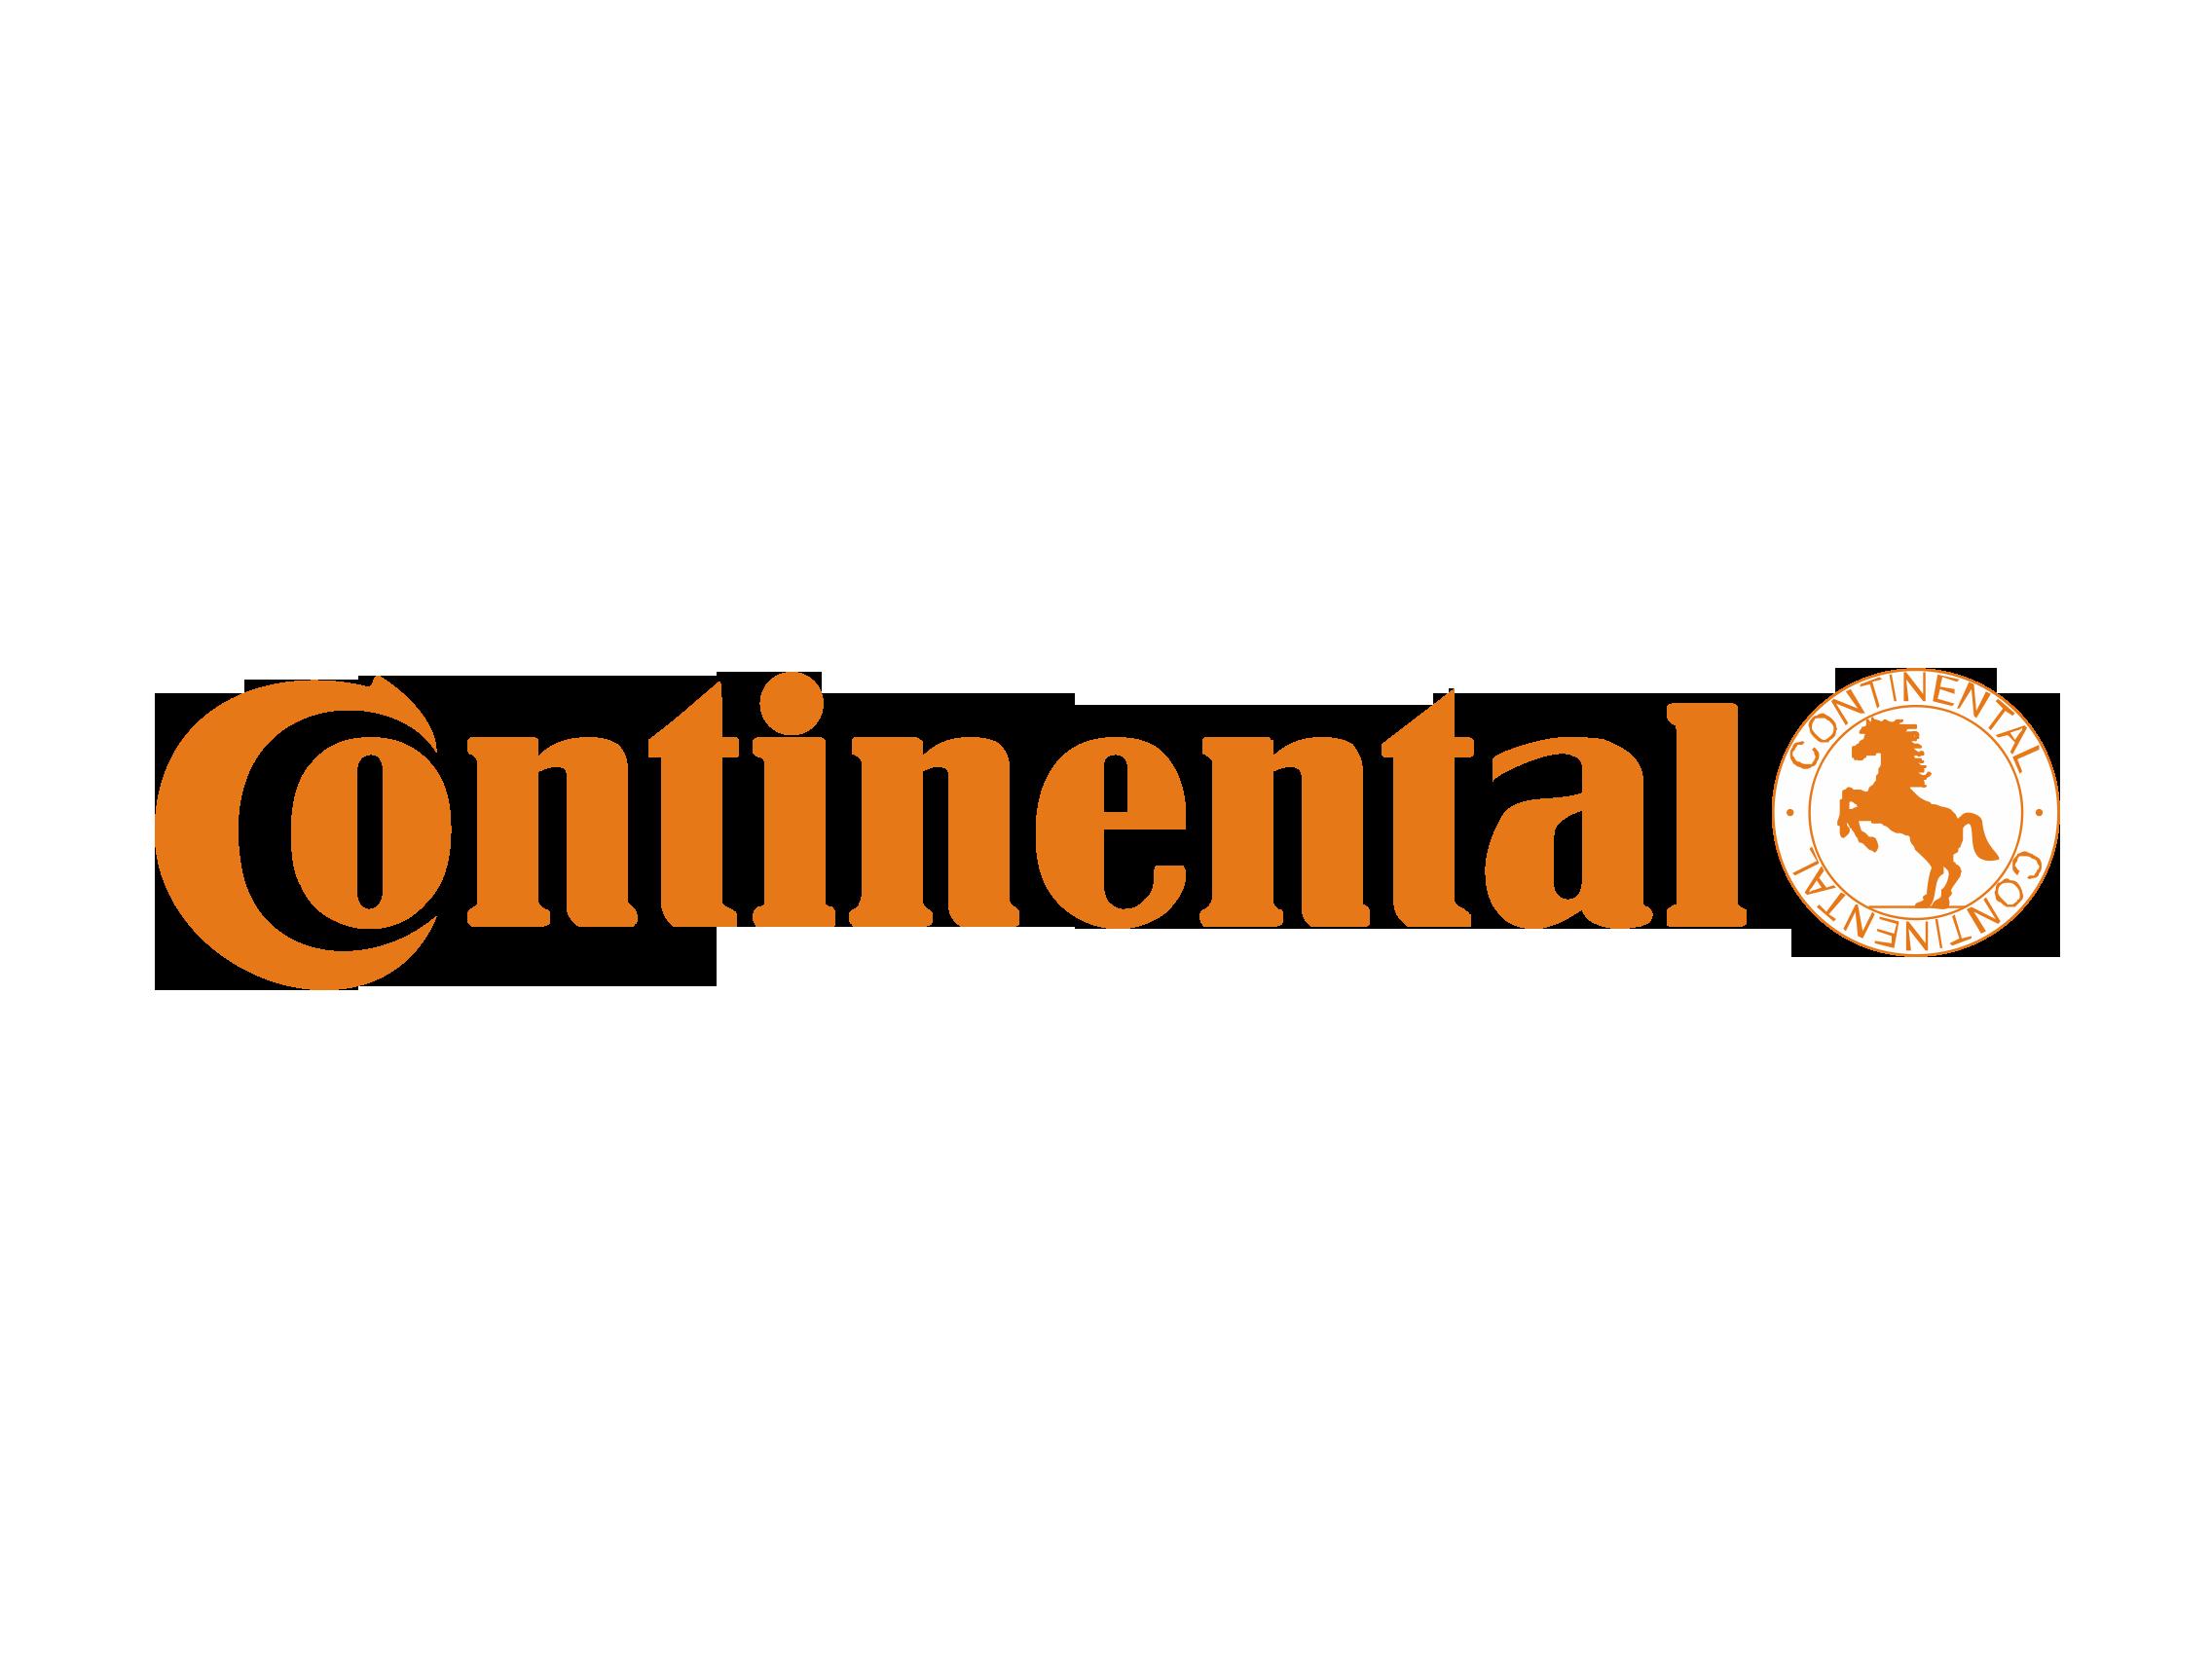 Continental Logo Wallpaper